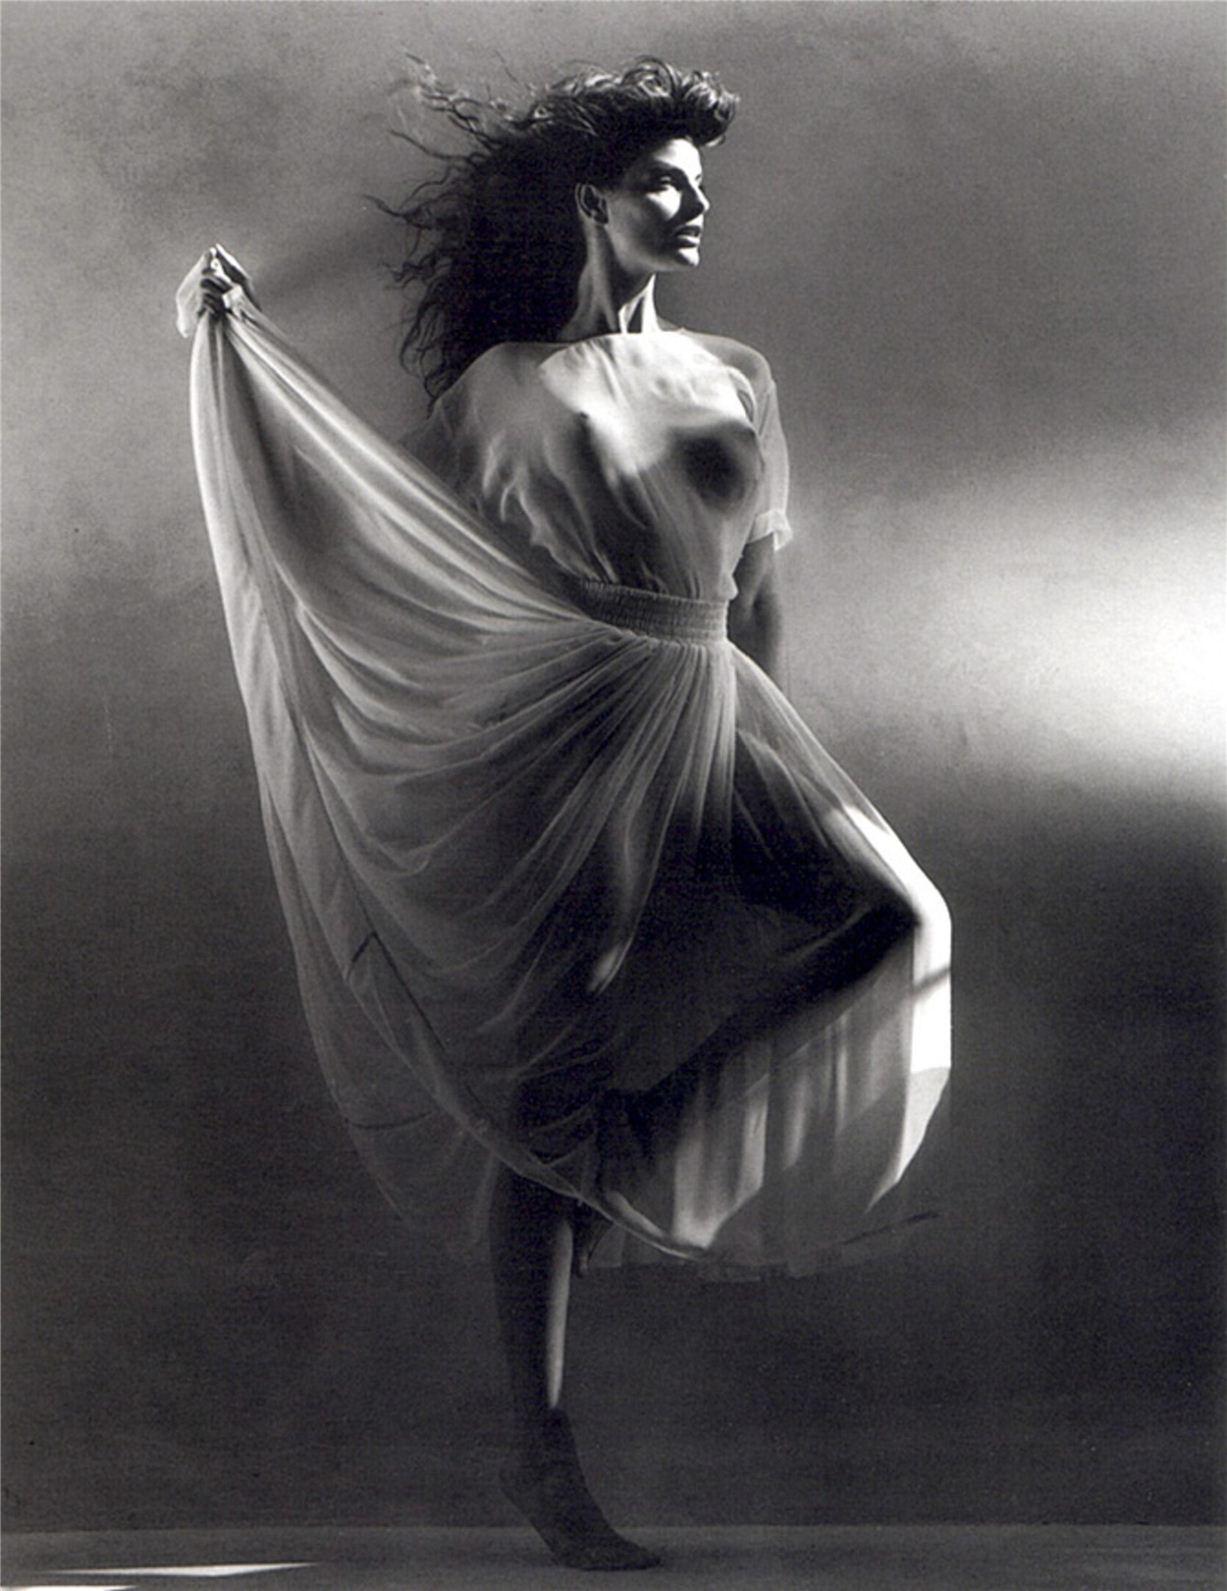 Joan Severance / Джоан Северанс - портрет фотографа Грега Гормана / Greg Gorman